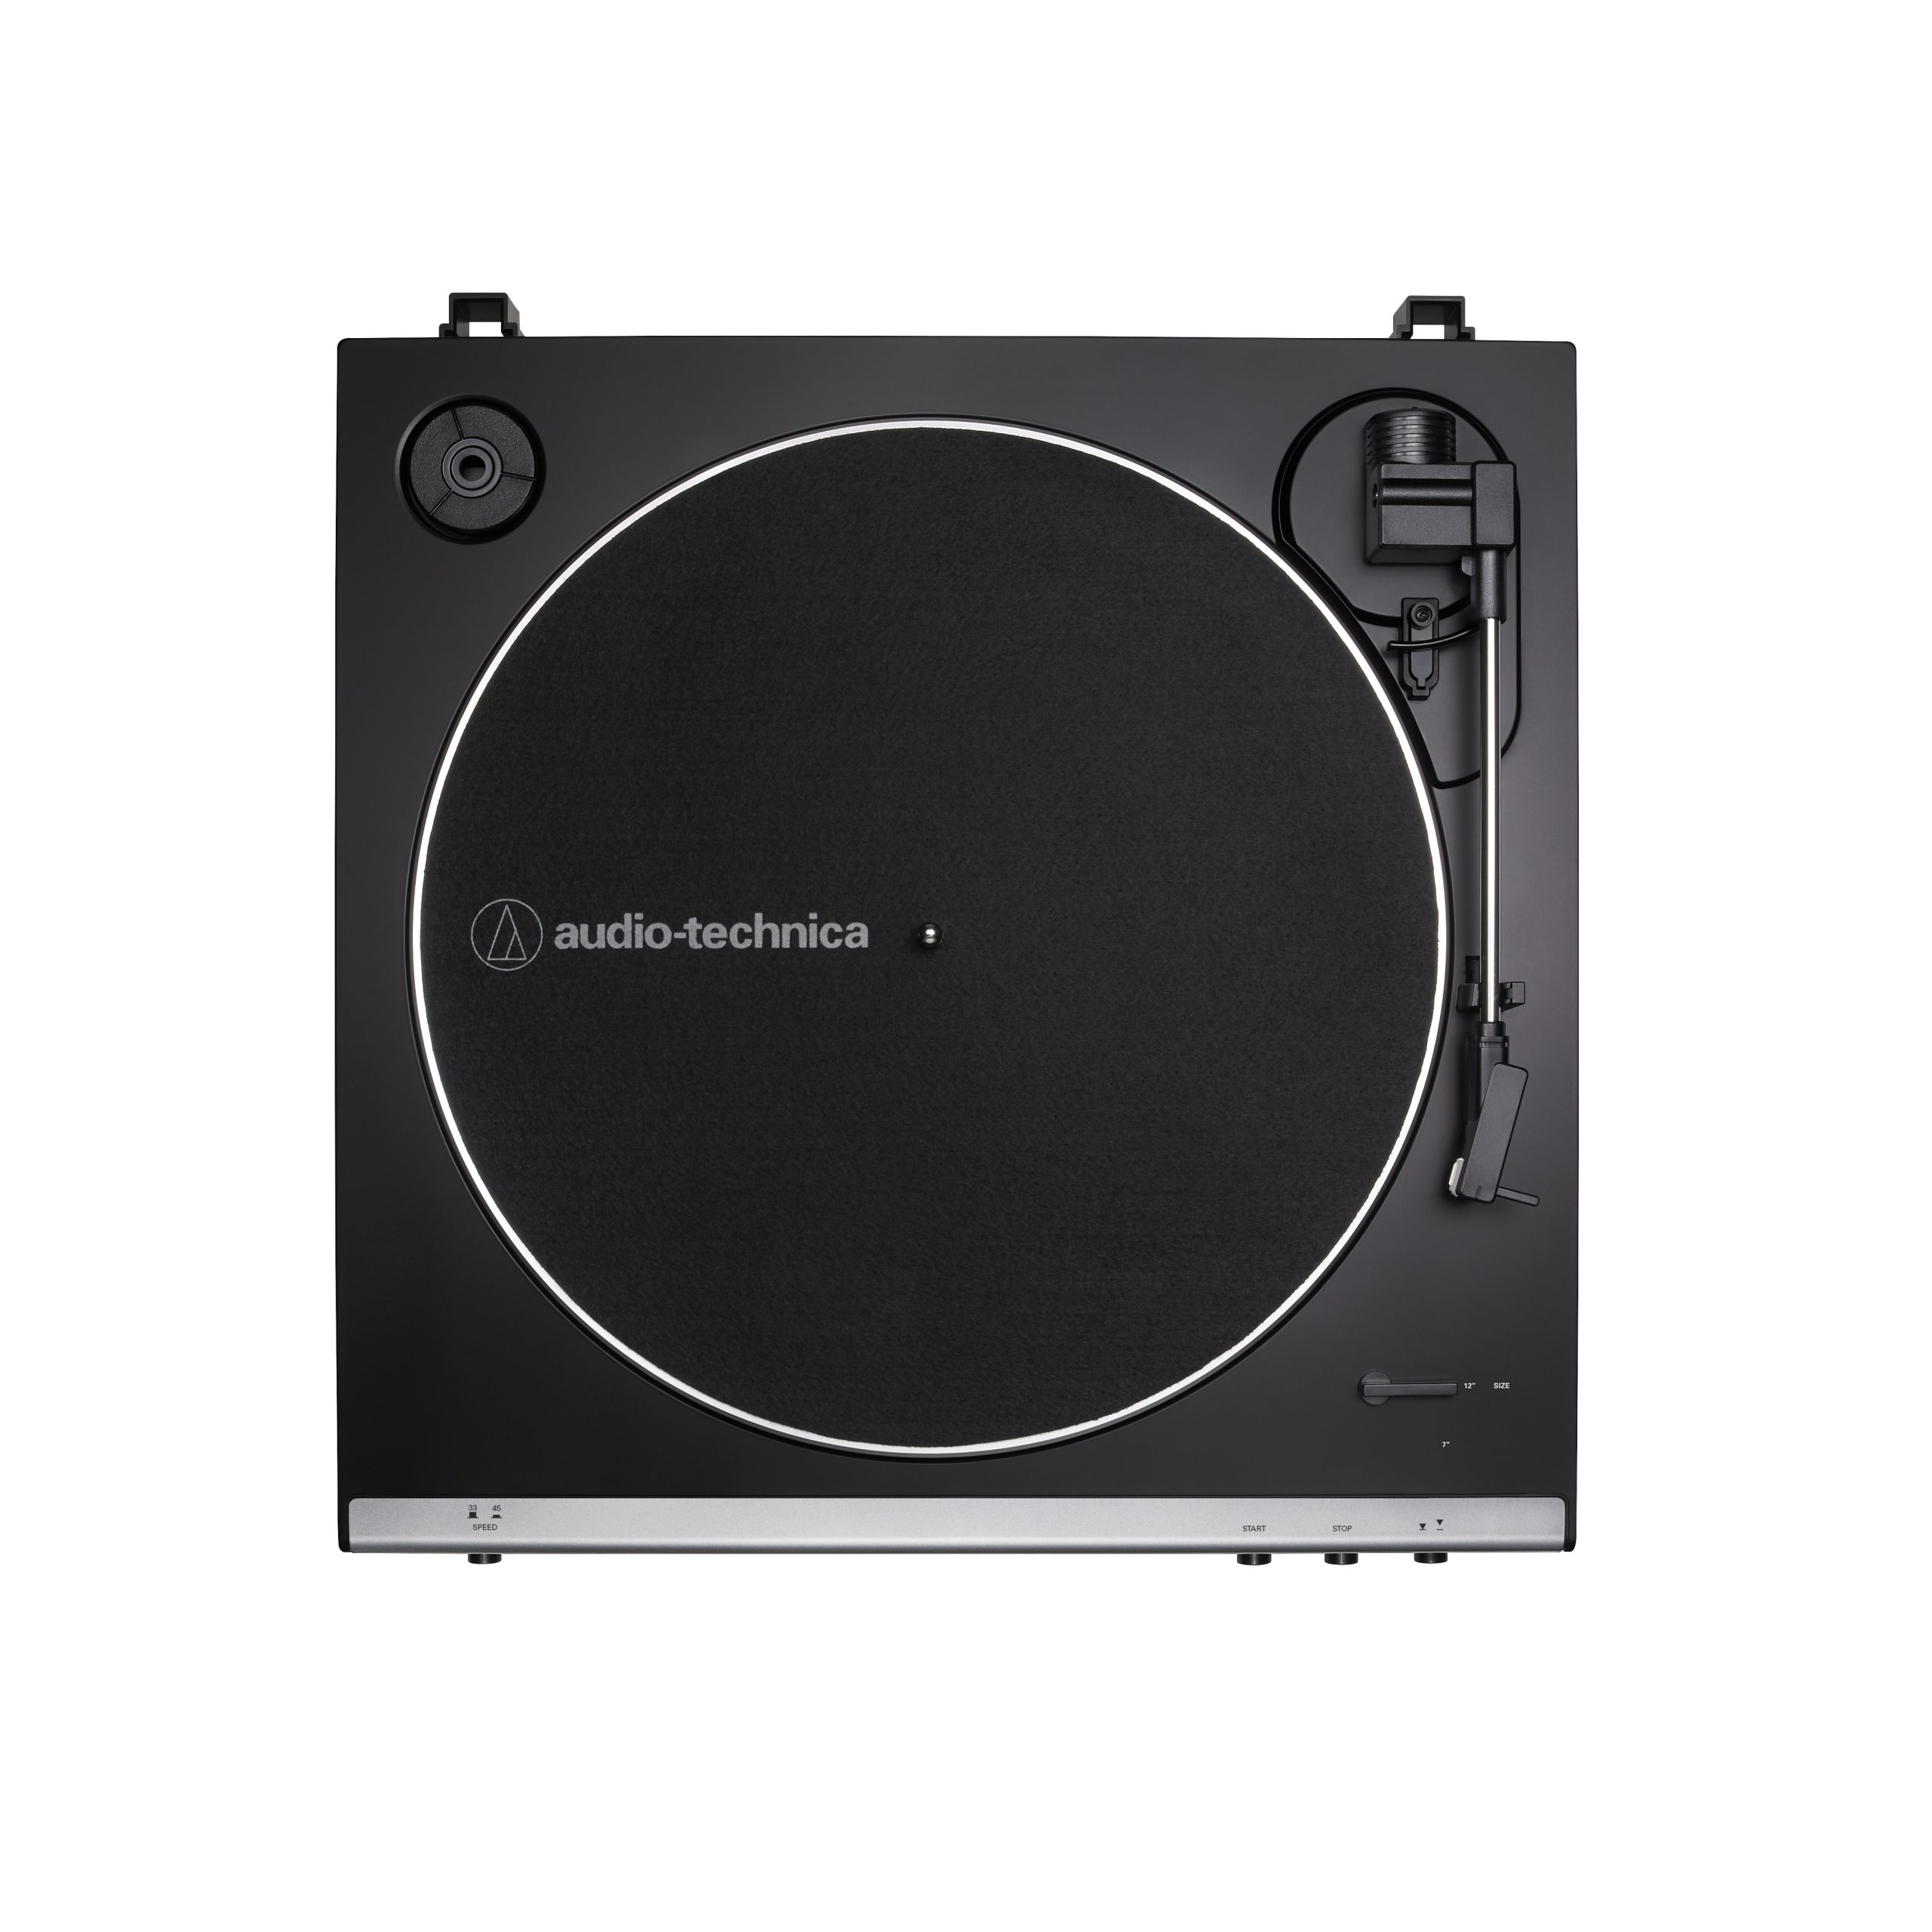 Audio Technica Turntable Singapore, Audio Technica AT-LP60X, Vinyl Player